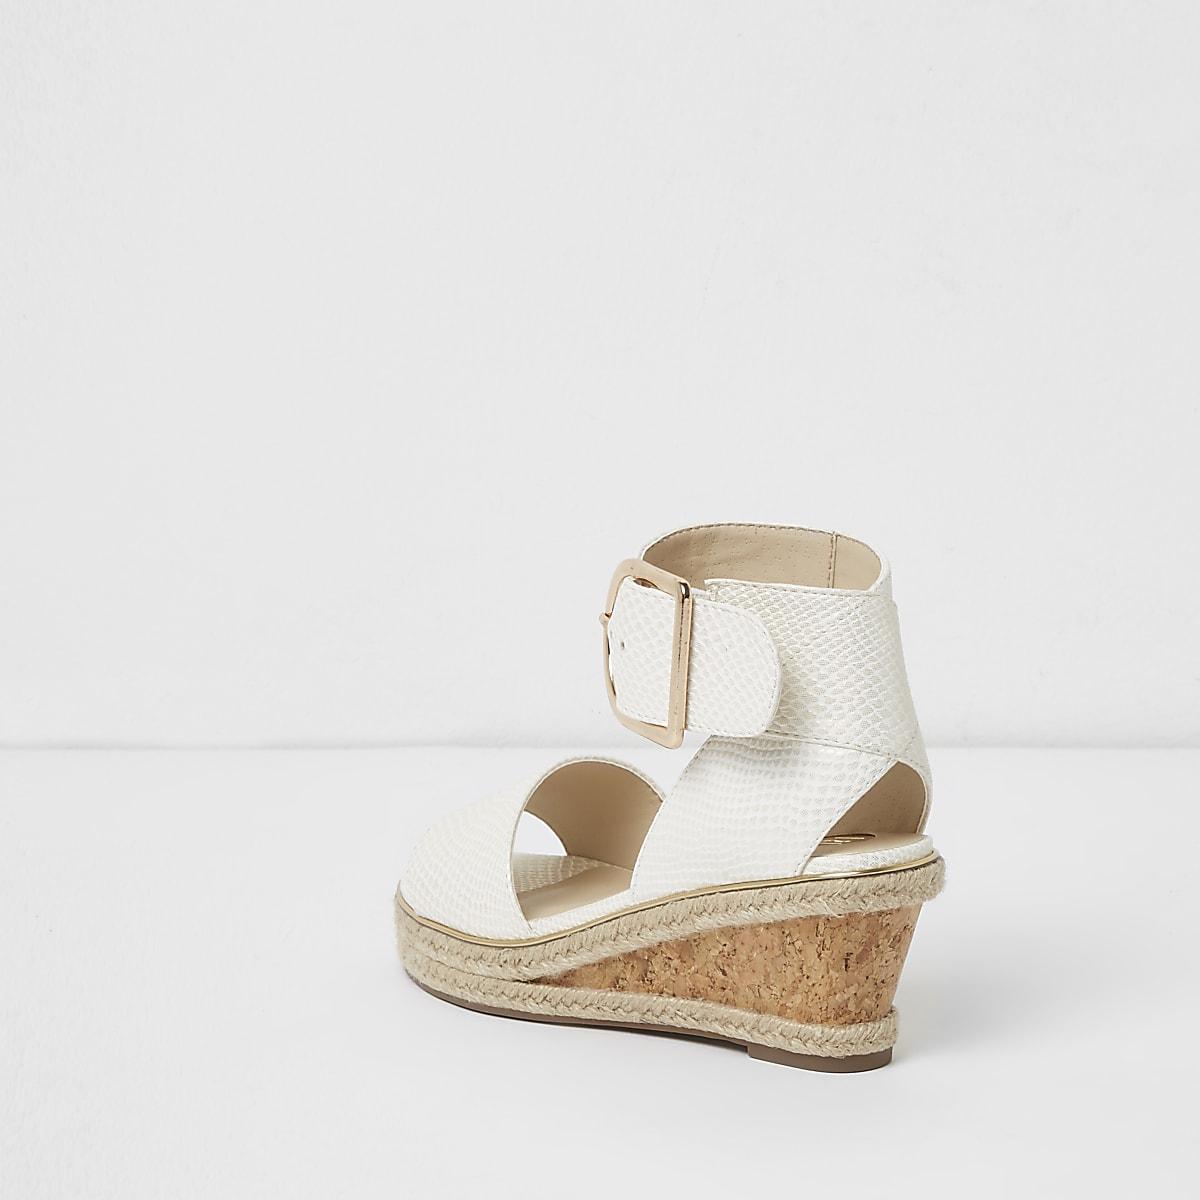 4f52b1faede8 Girls white snake embossed espadrille wedges - Sandals - Footwear ...